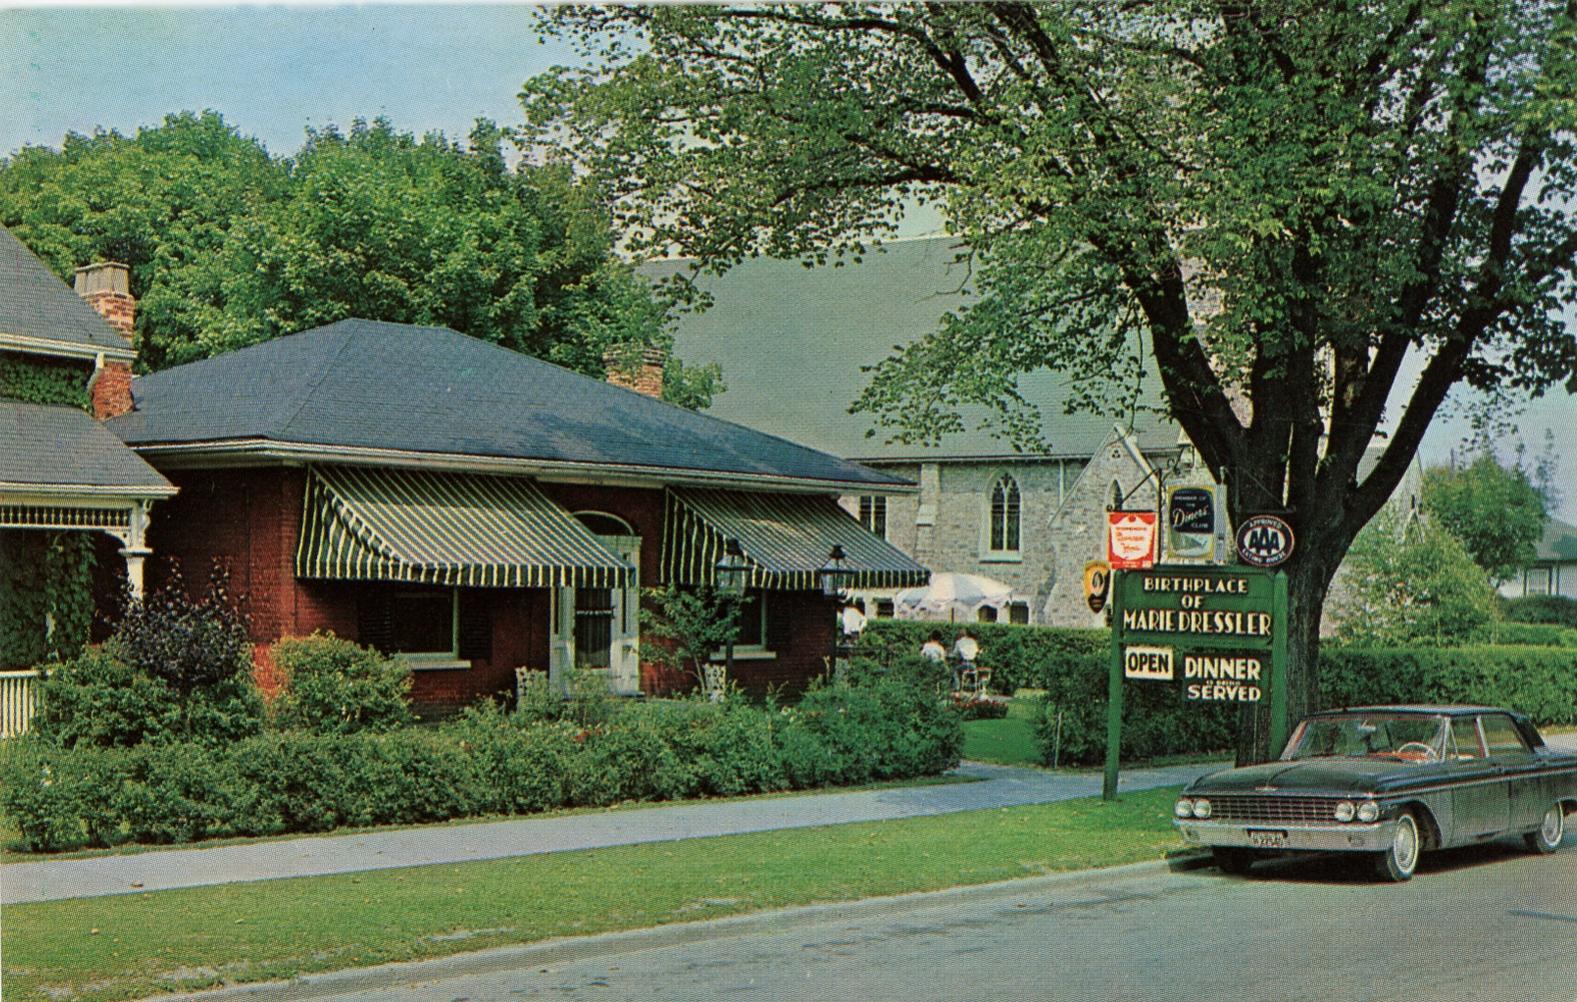 Exterior of Marie Dressler House Restaurant   Postcard  c. 1970's  Marie Dressler Foundation collection